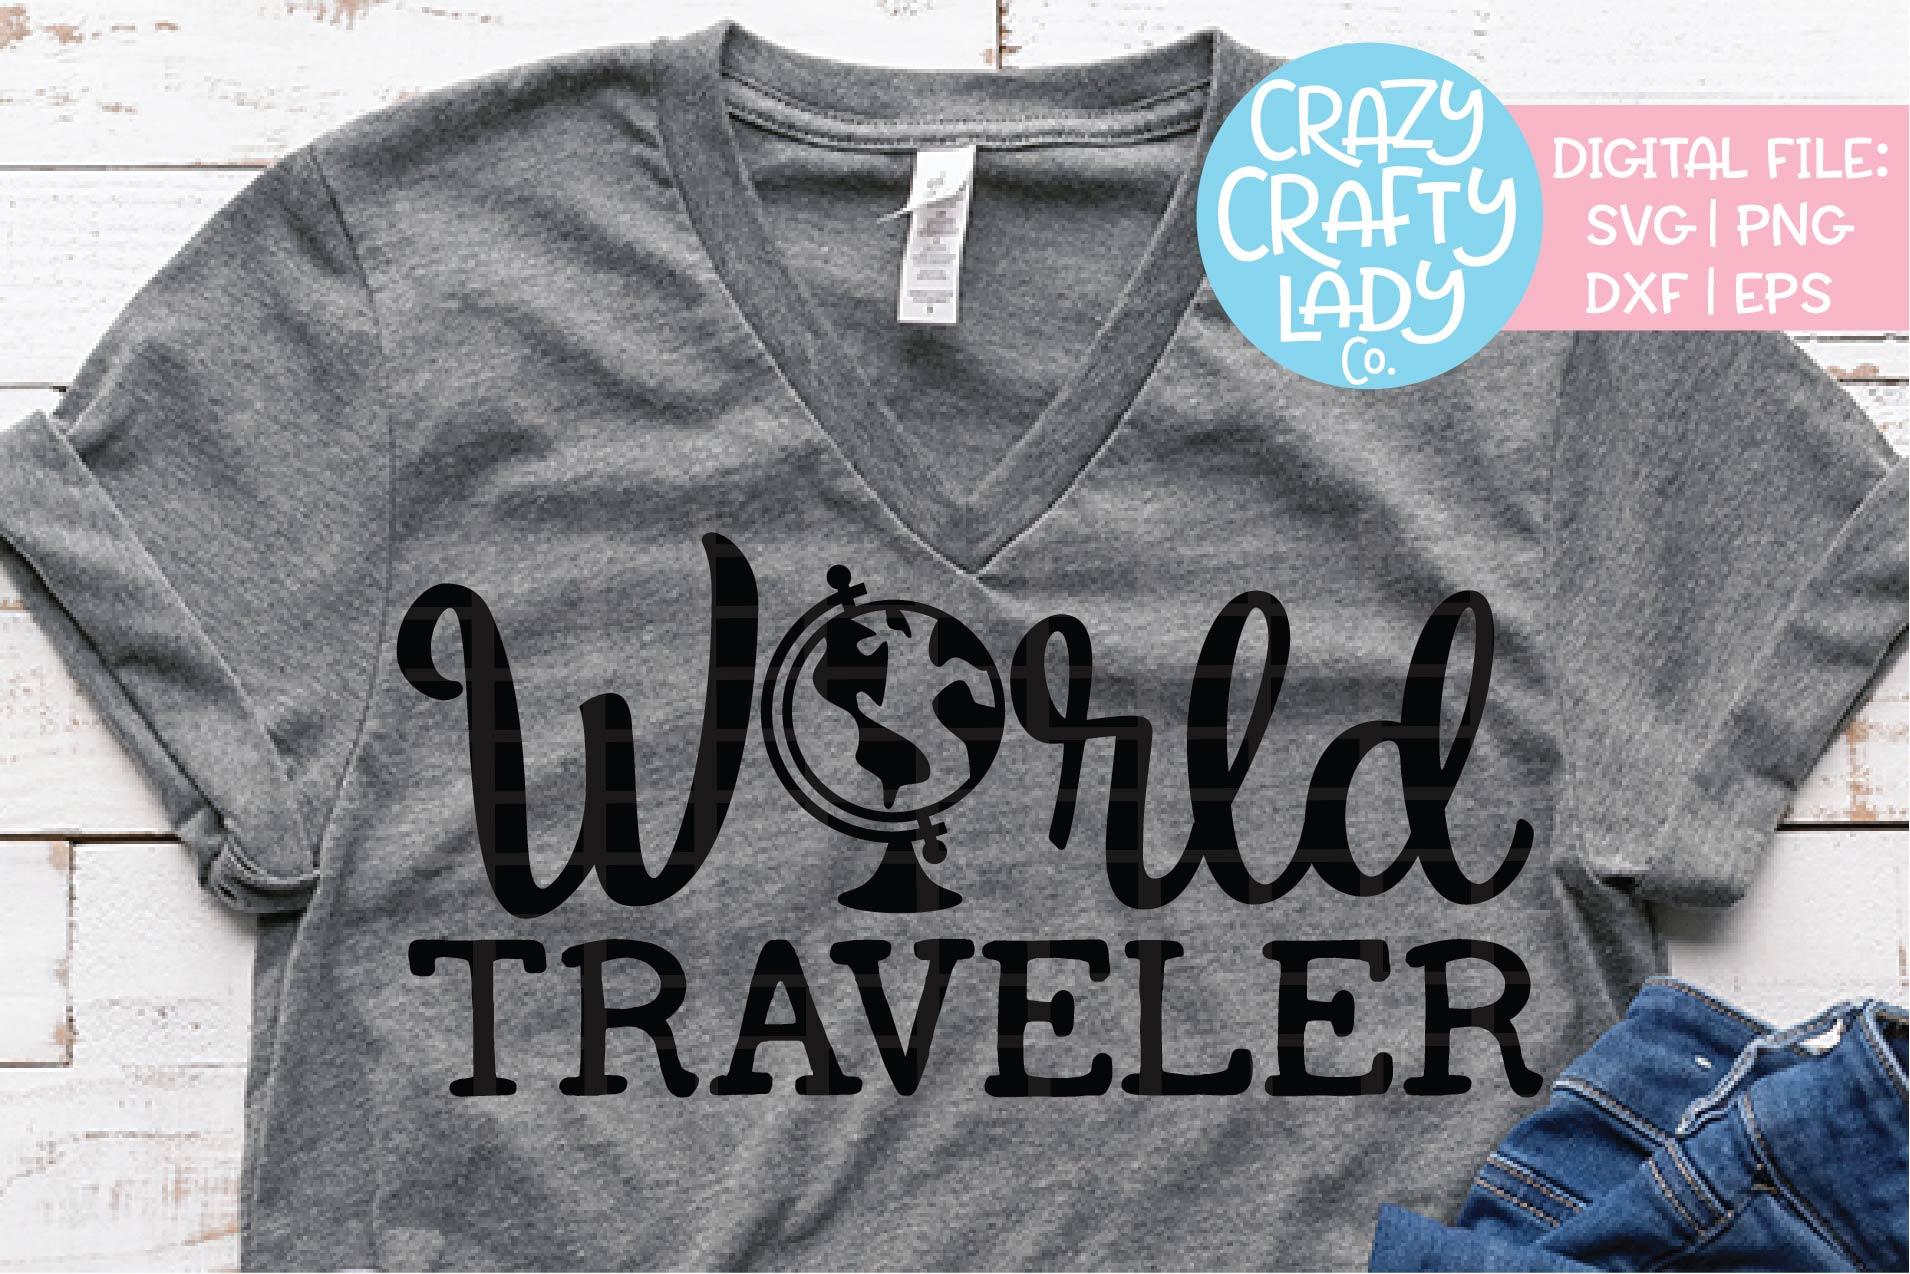 World Traveler SVG DXF EPS PNG Cut File example image 1